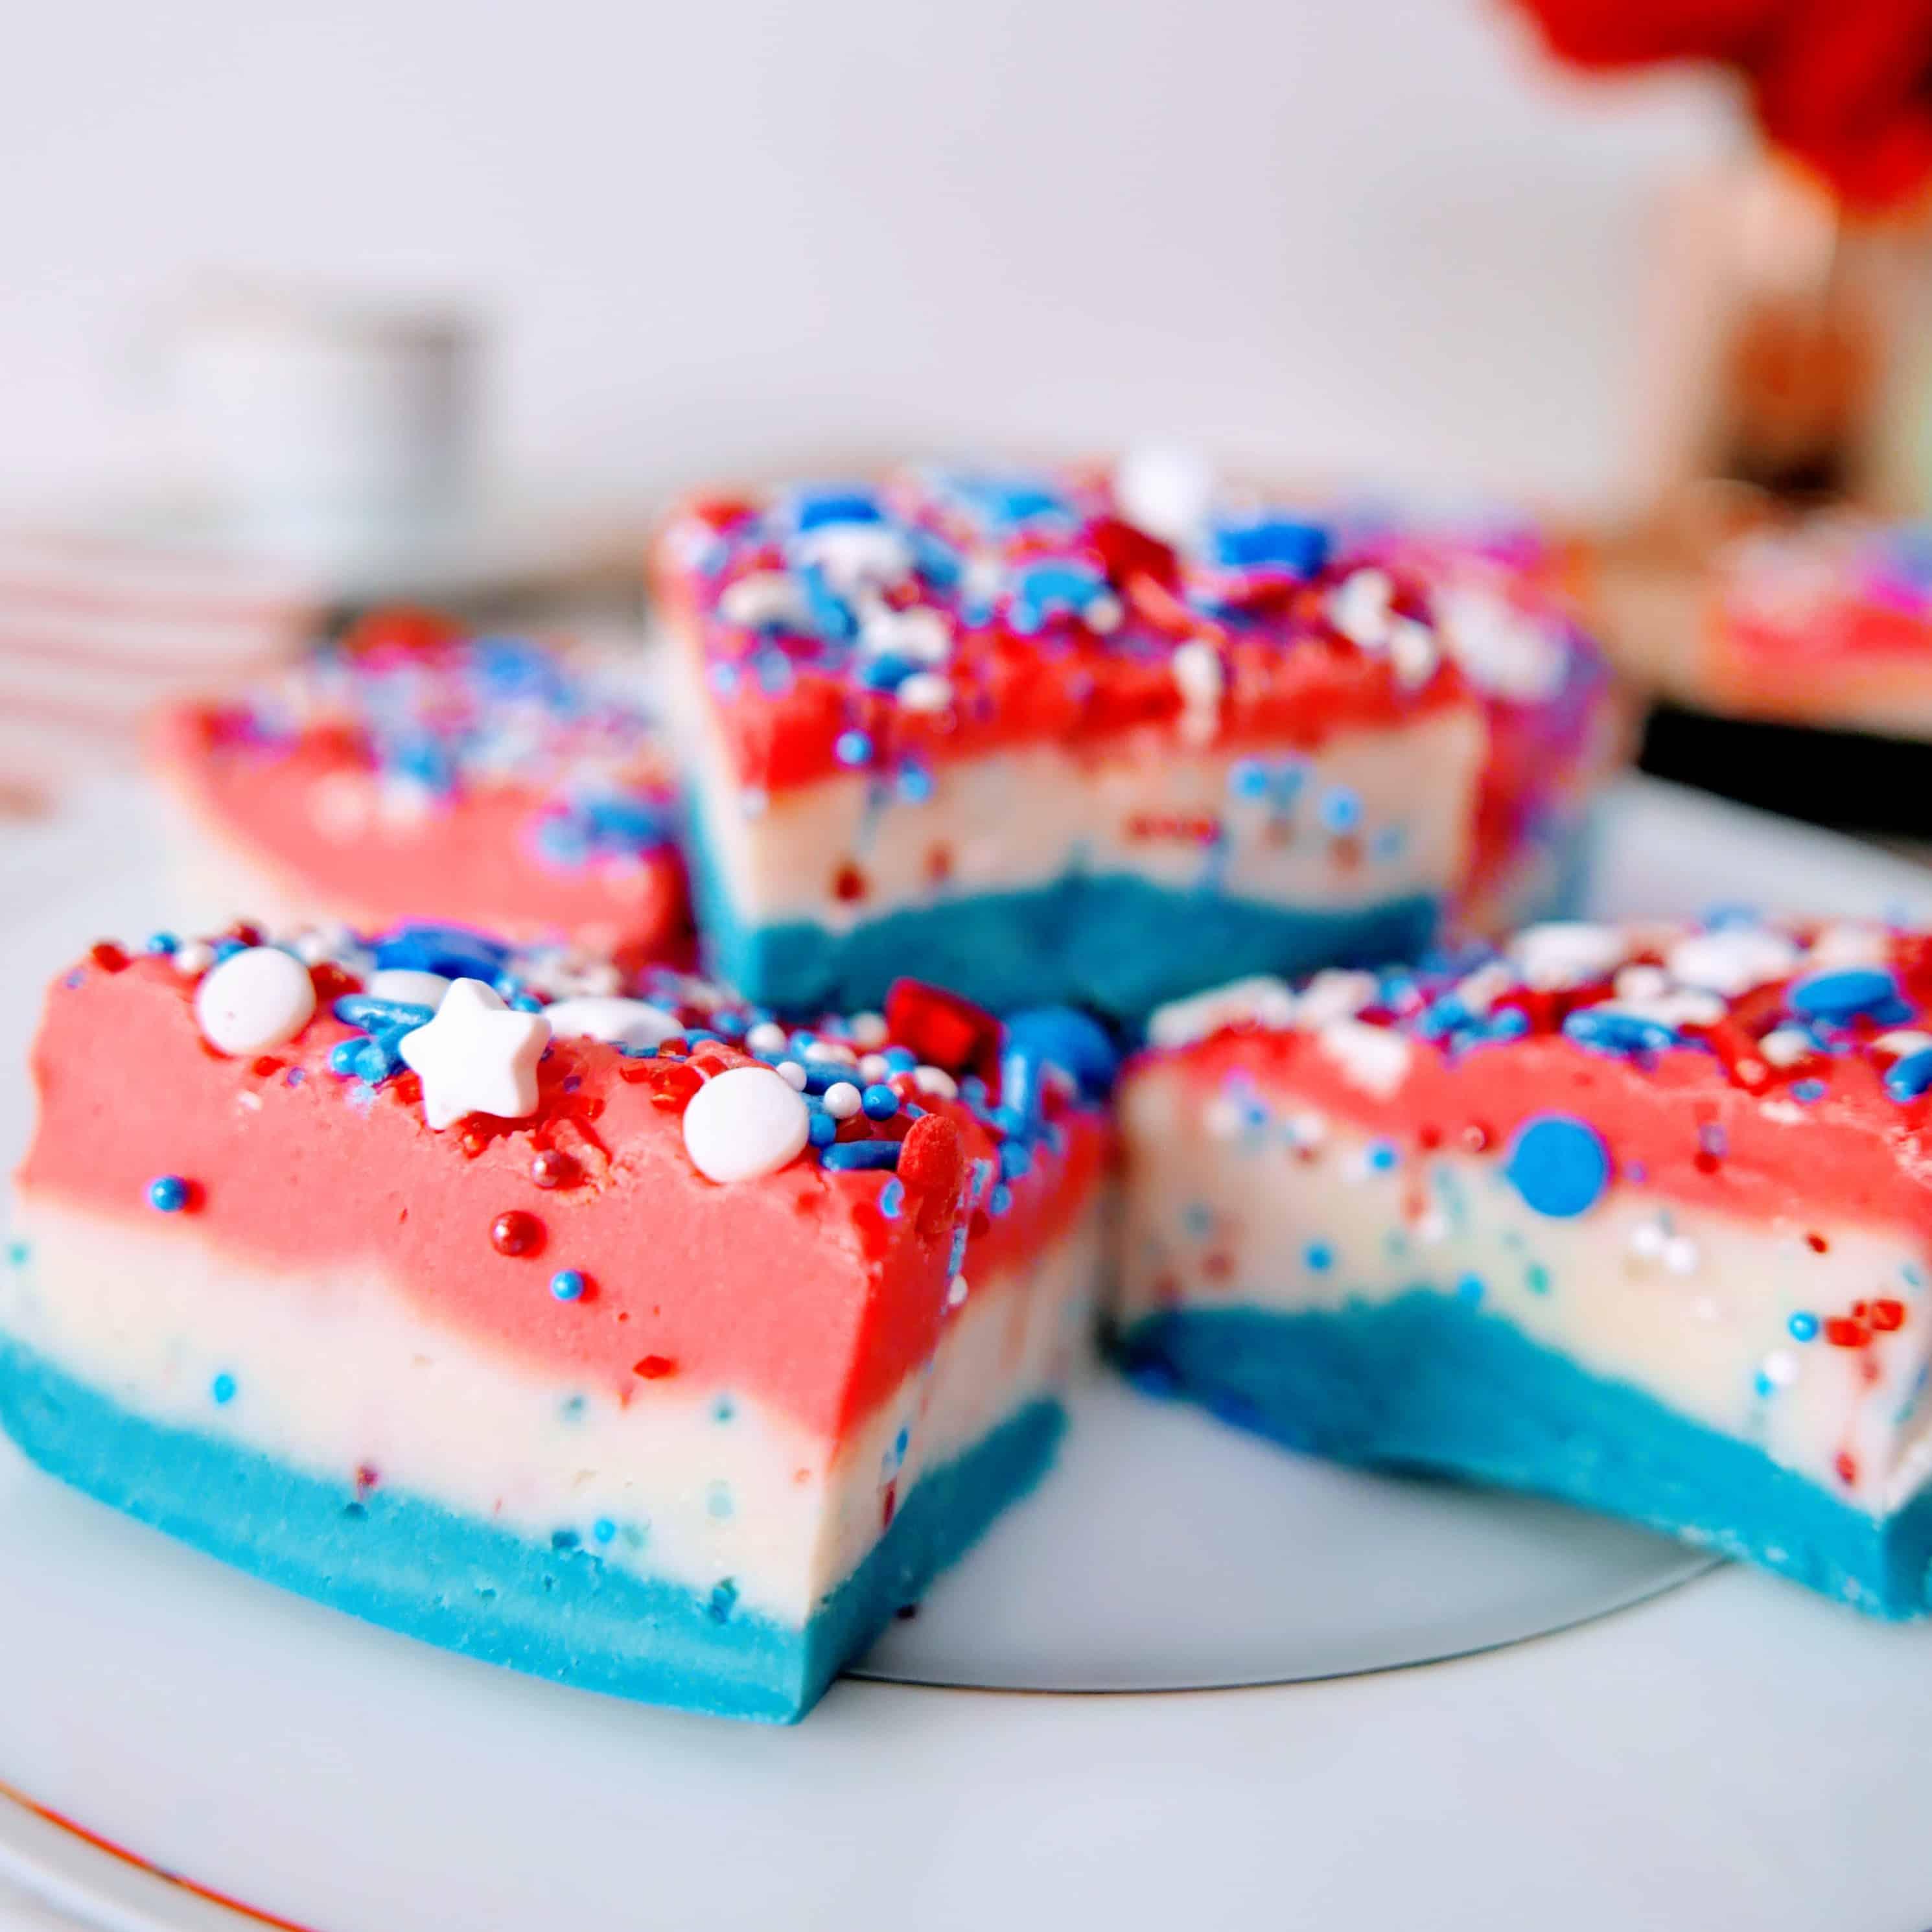 sliced pieces of layered patriotic vanilla fudge